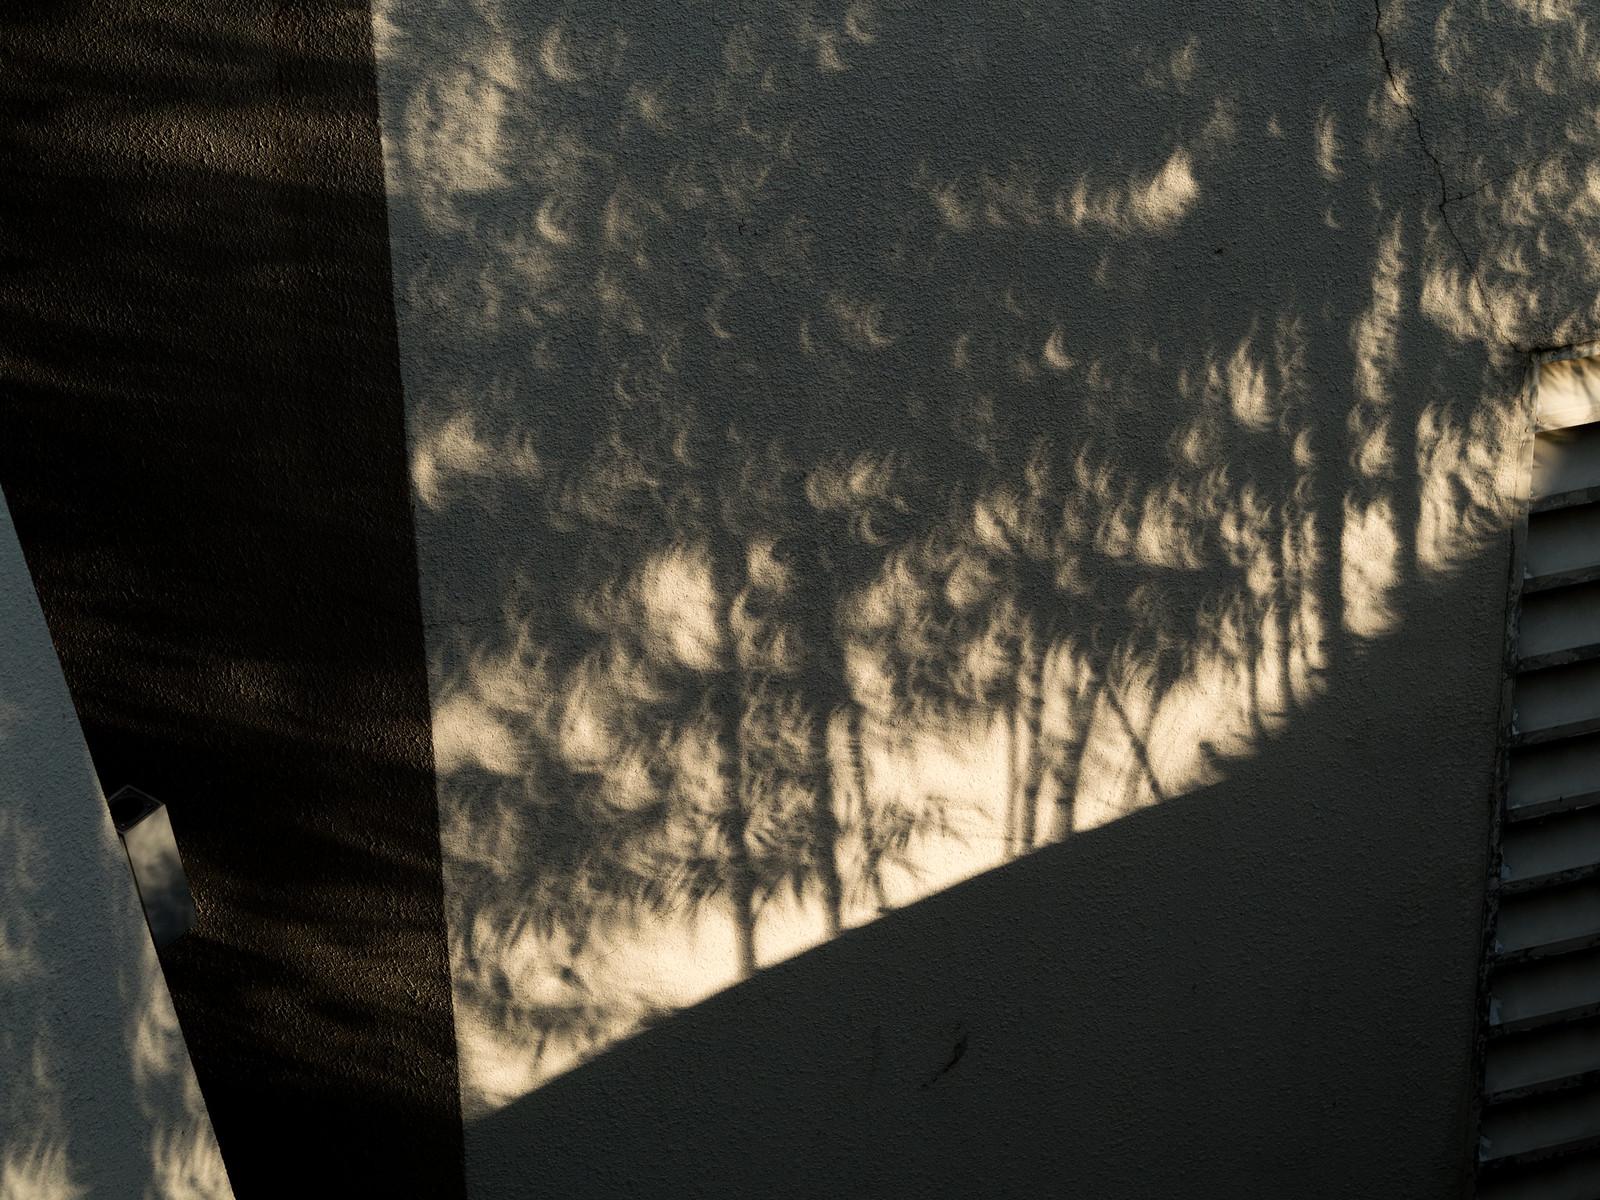 Bayang-bayang dedaun berbentuk bulan sabit